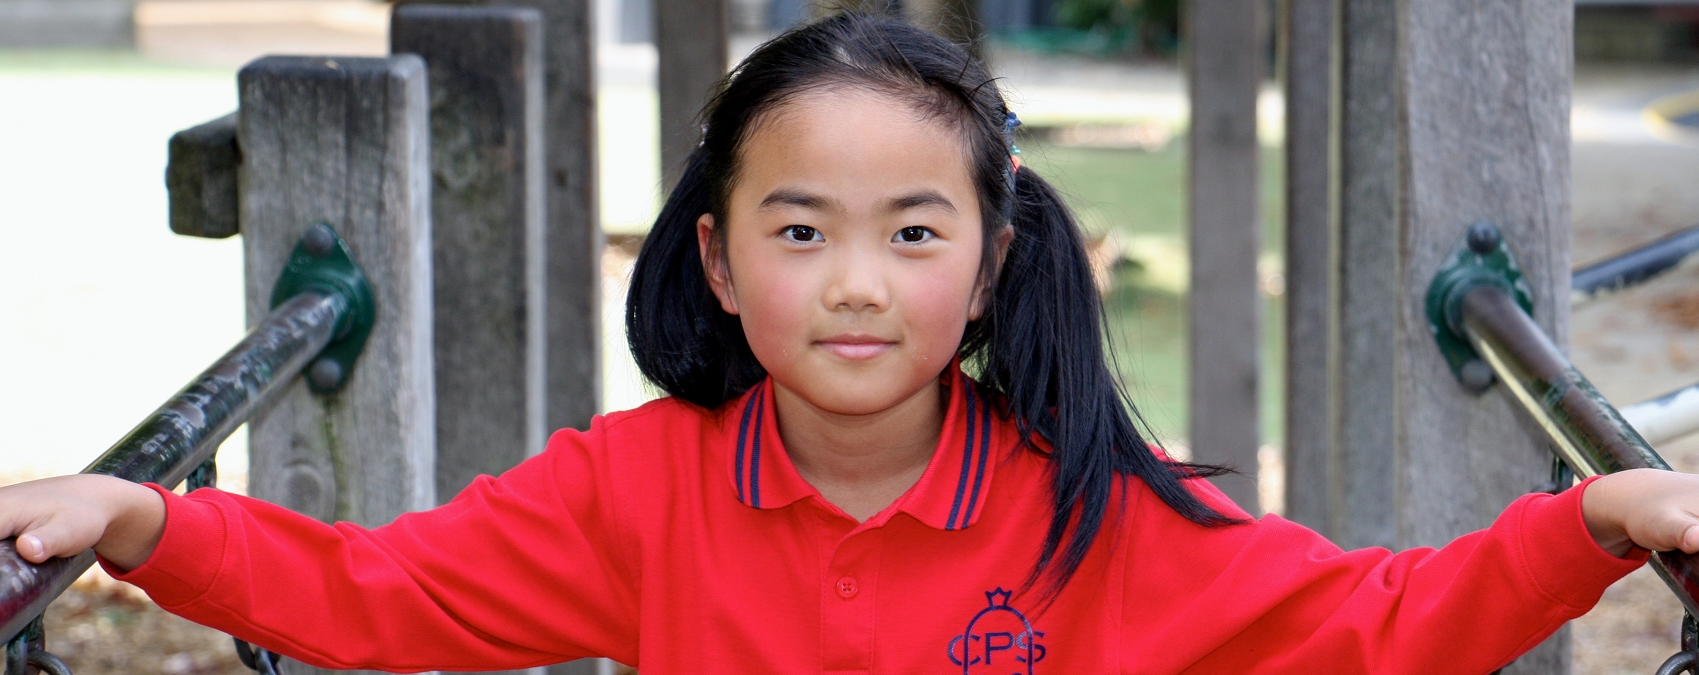 Camberwell Primary School Student